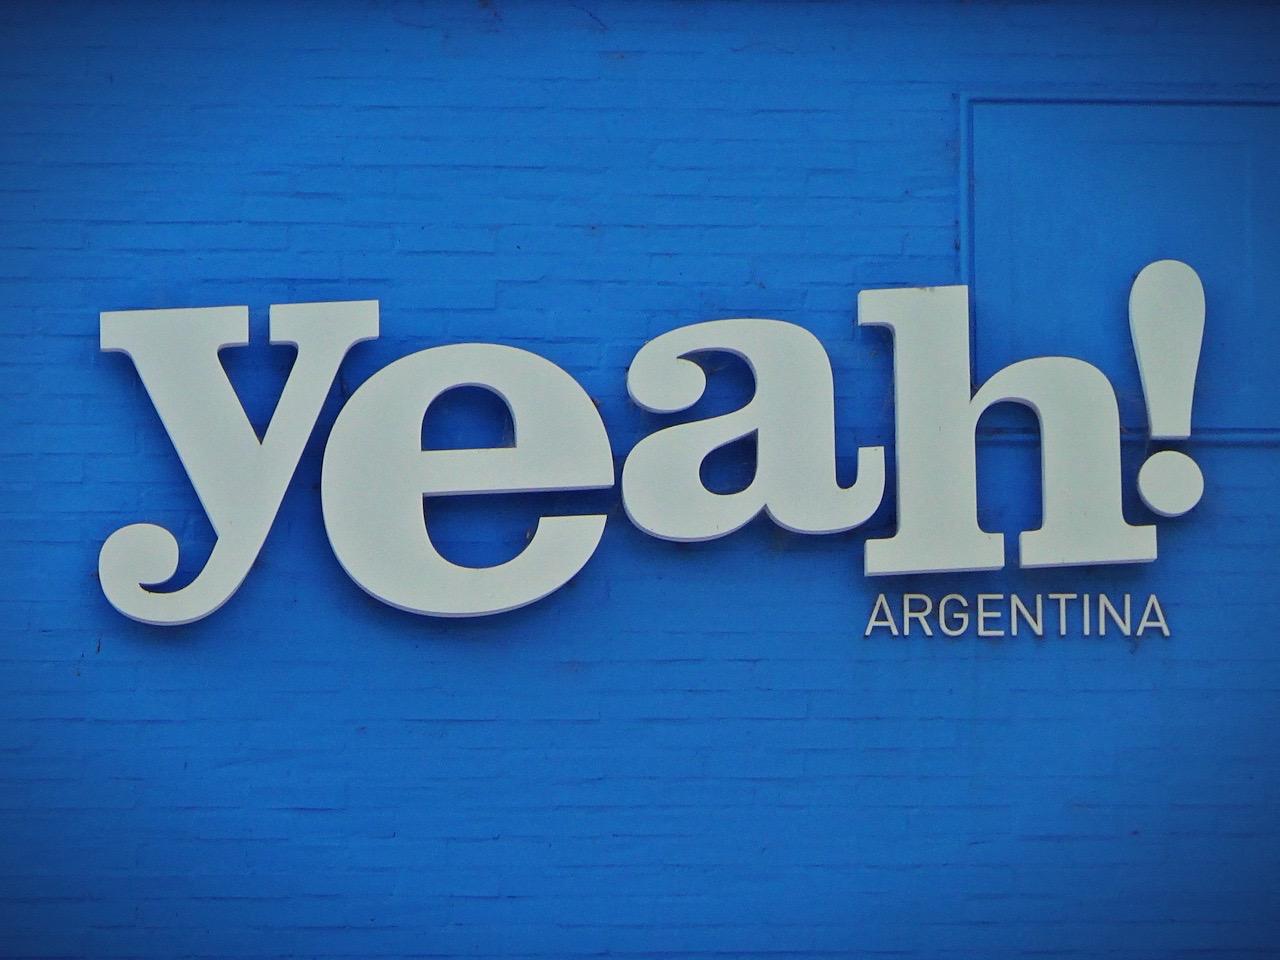 Yeah Argentina!